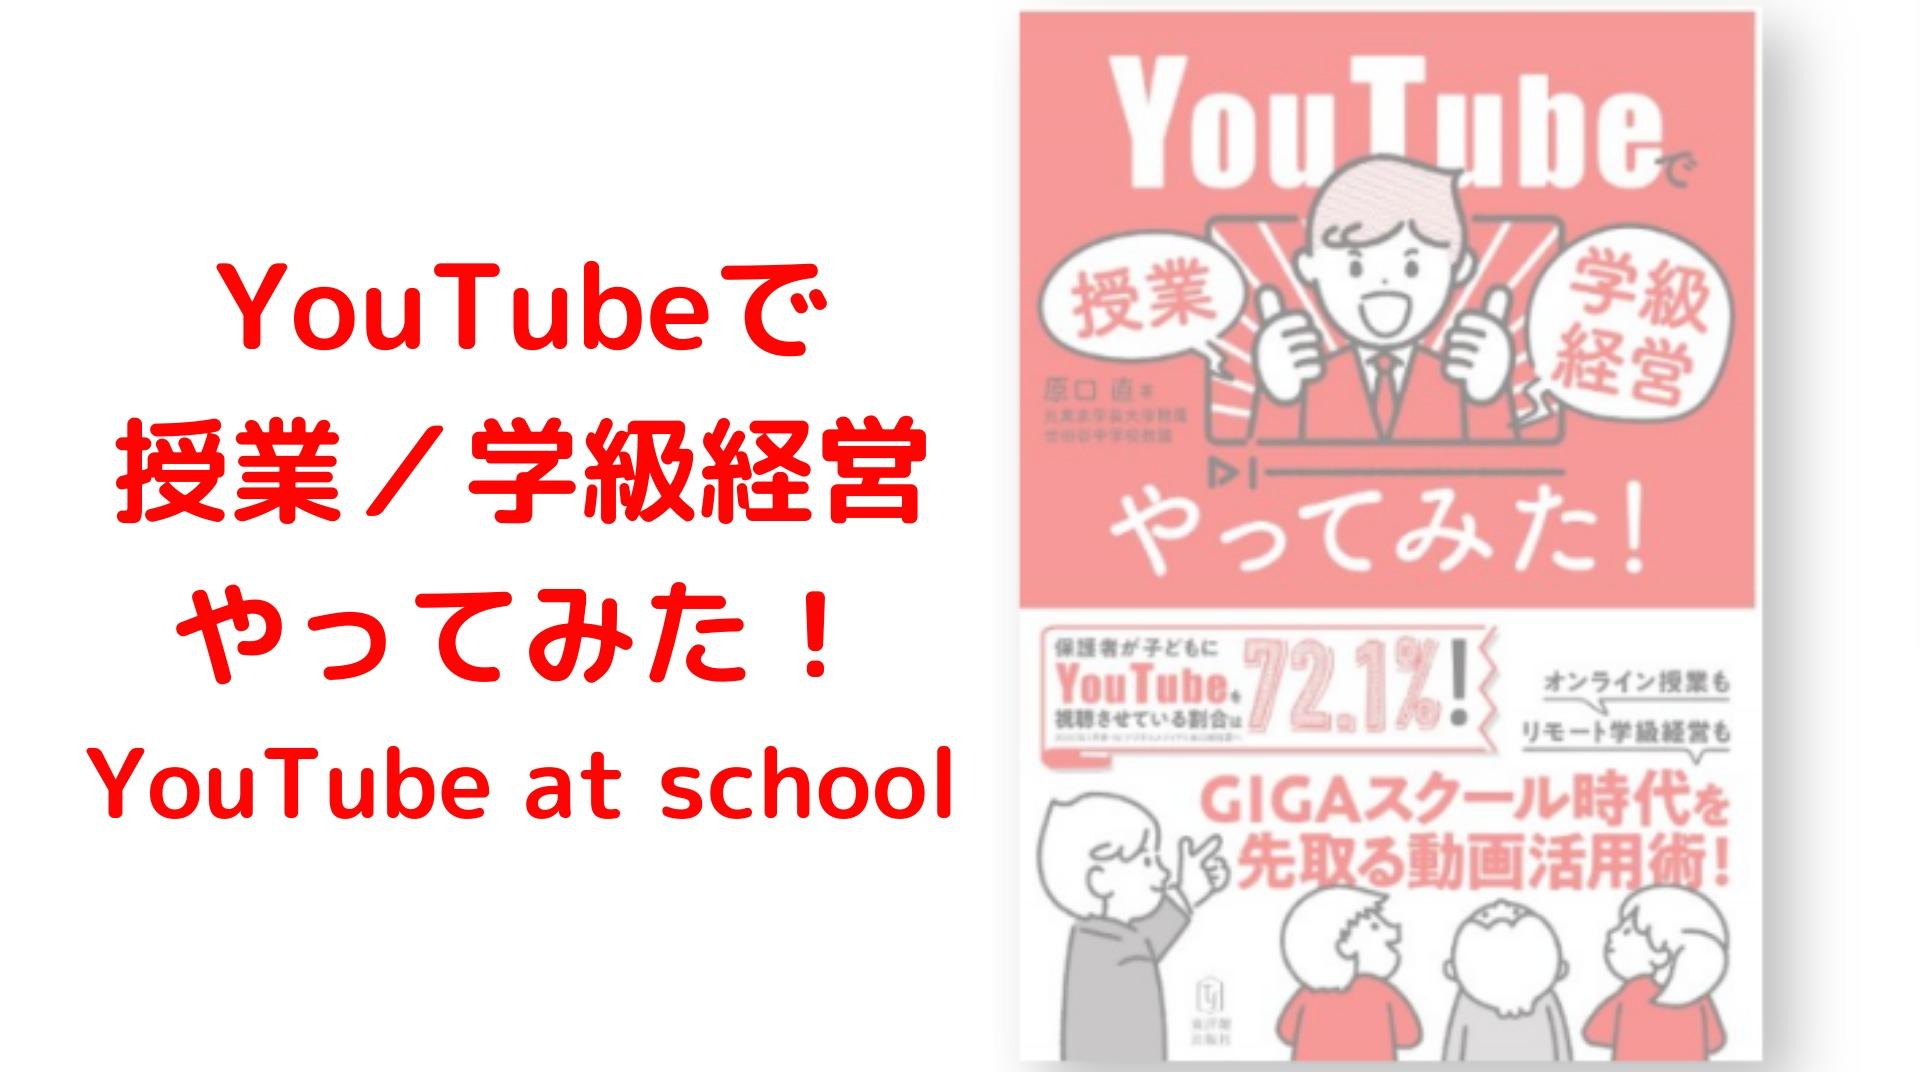 YouTubeで授業/学級経営やってみた!